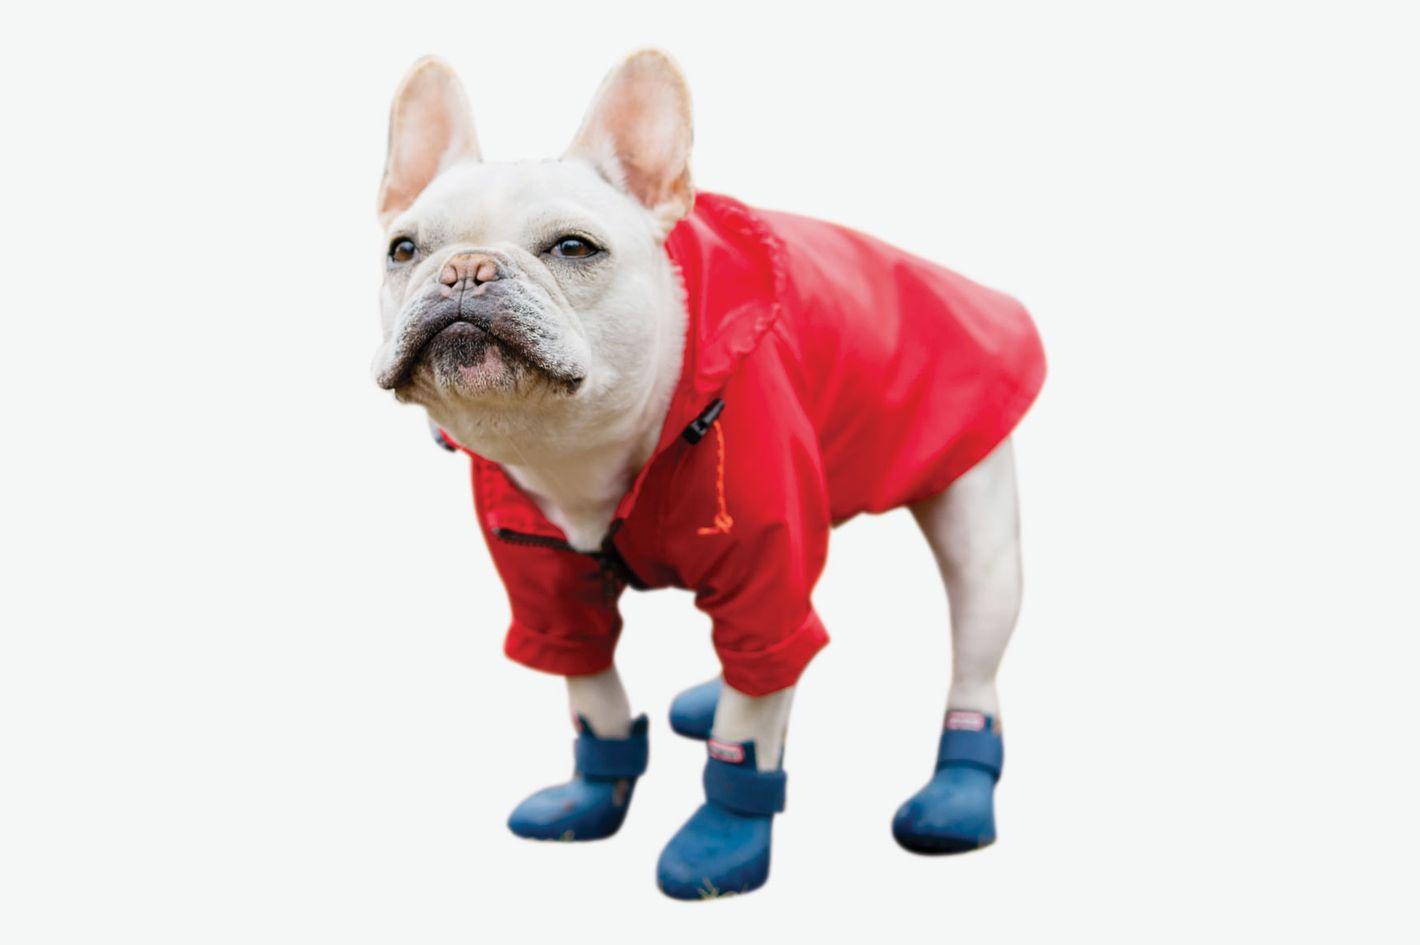 RubberRain Boots